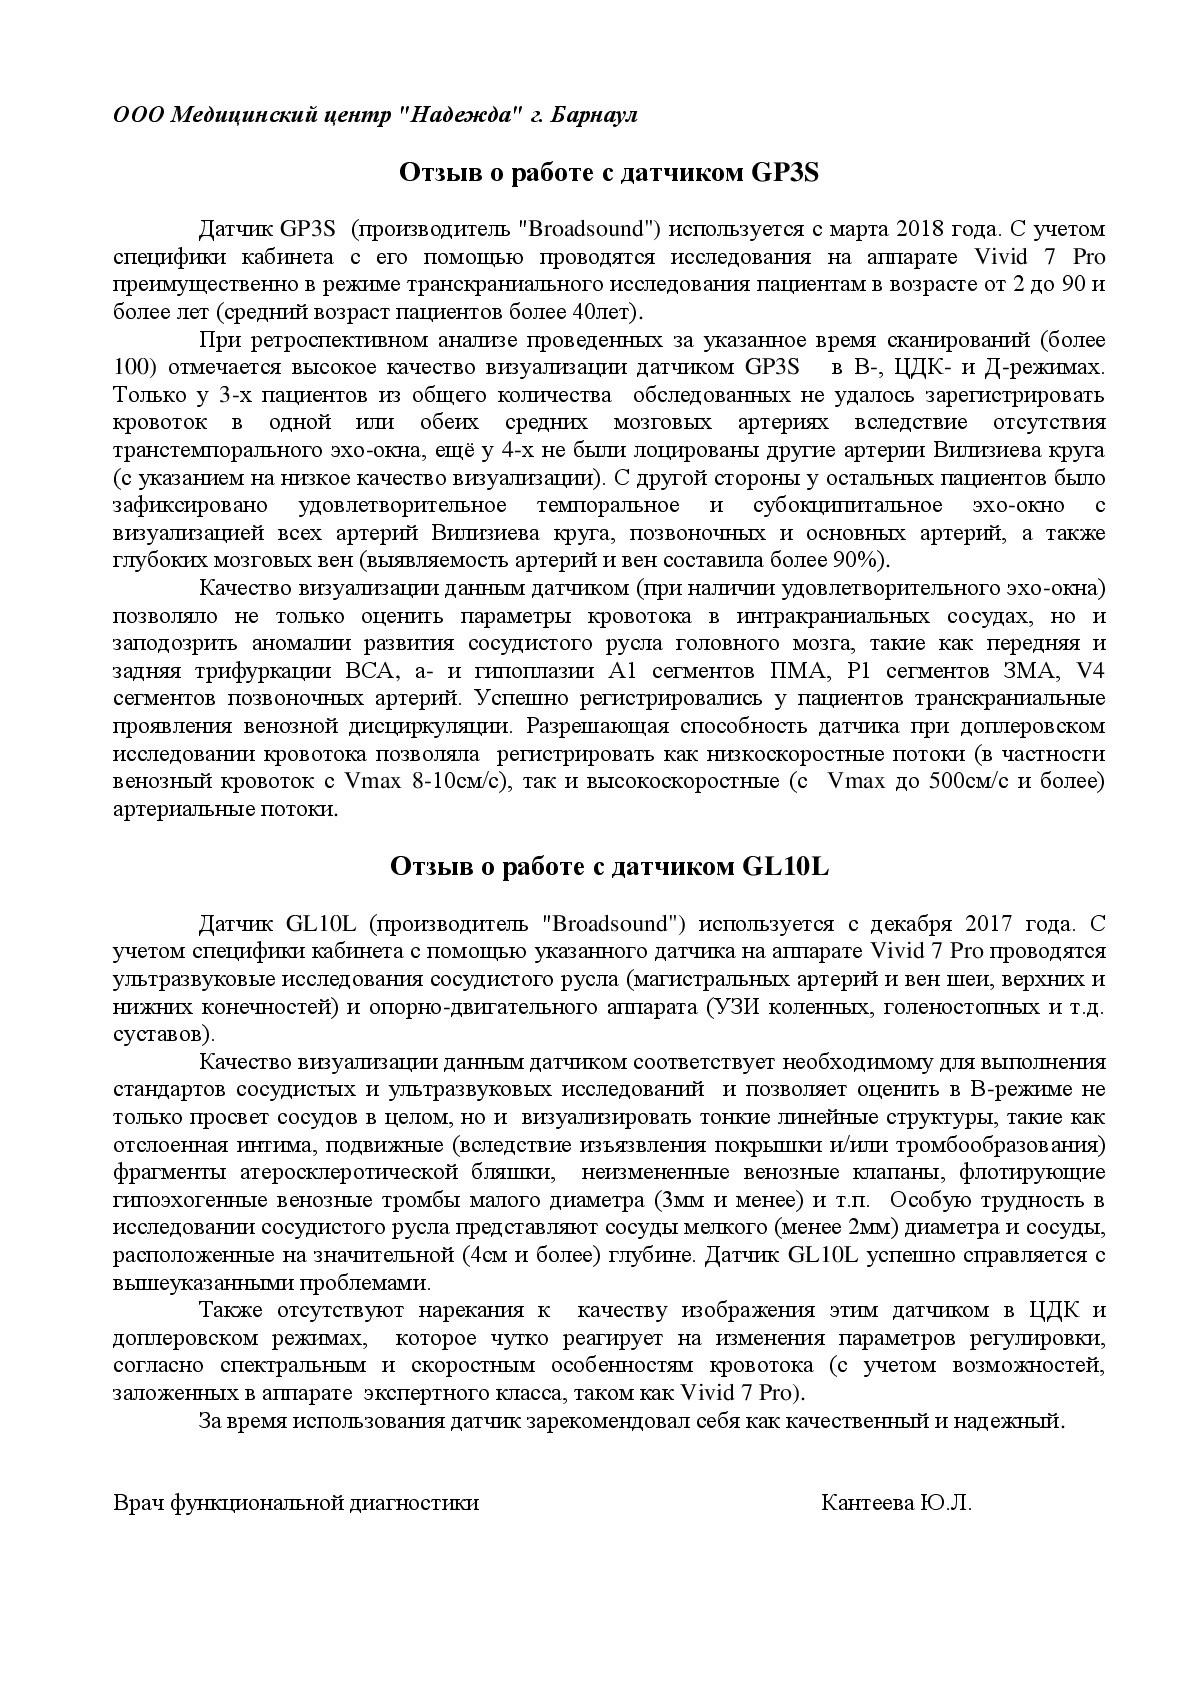 Отзыв о датчиках Broadsound GP3S и GL10L г. Барнаул